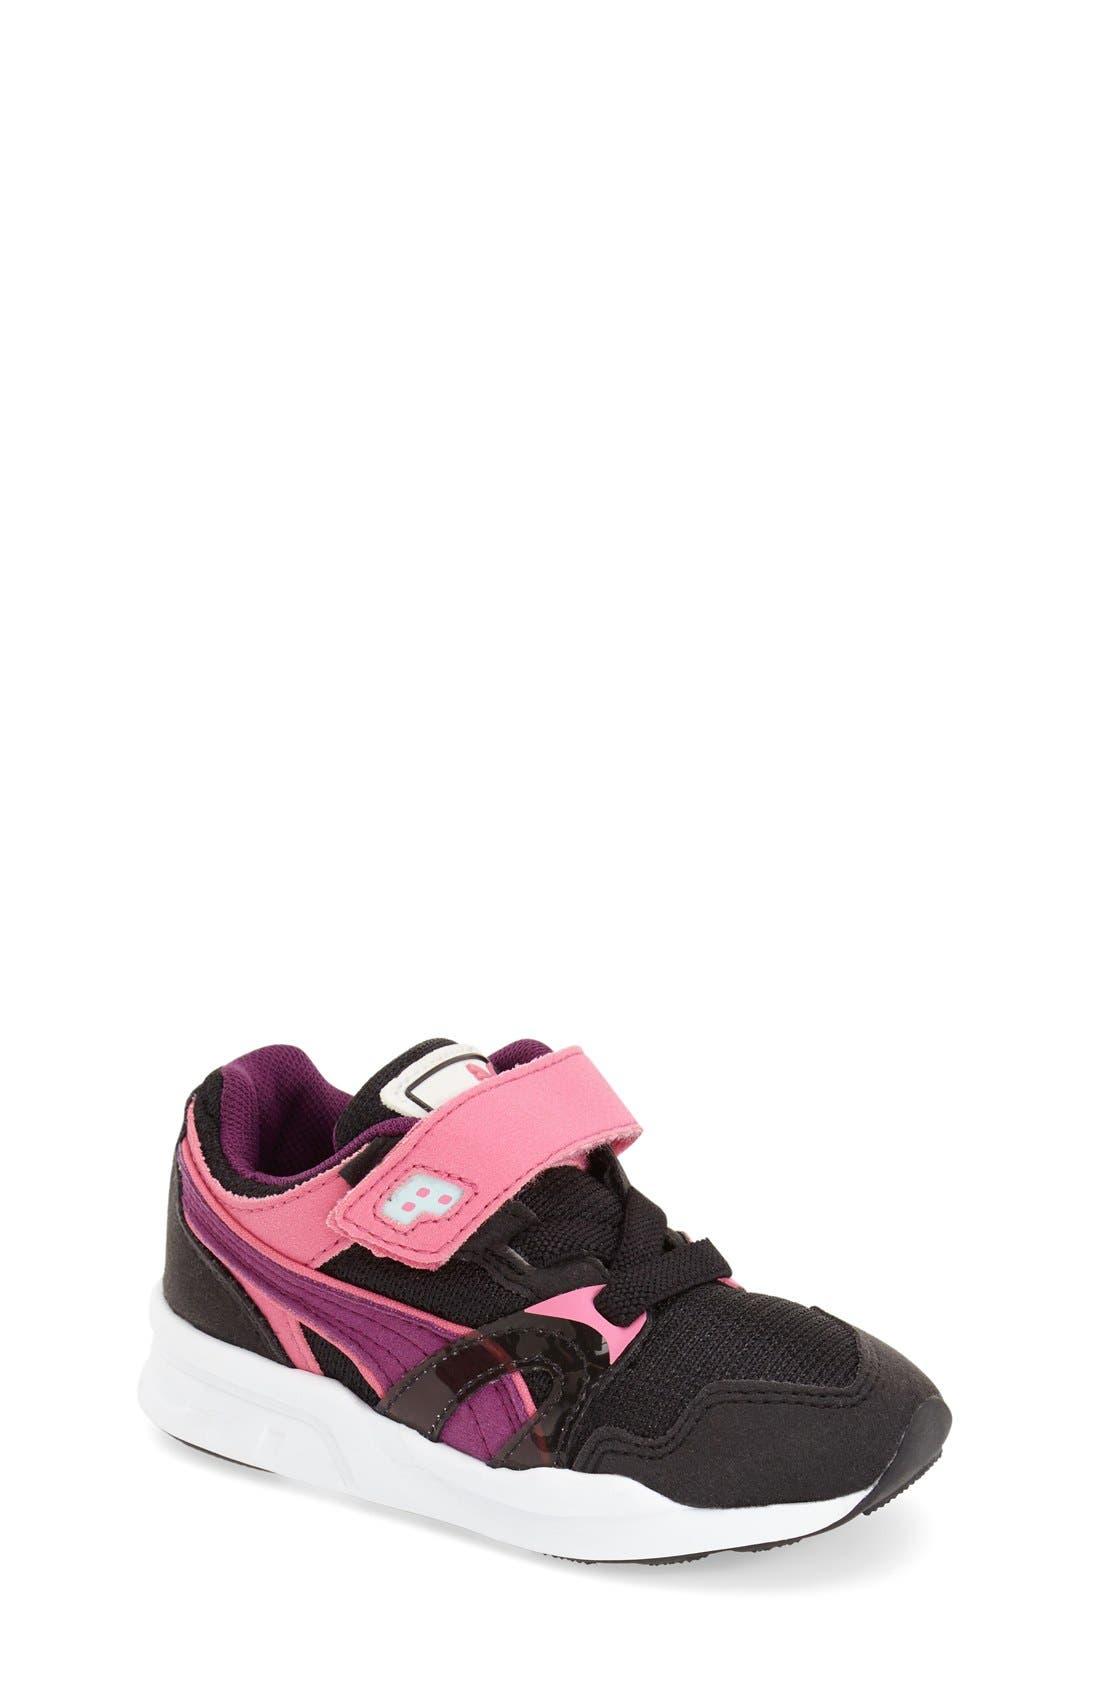 Alternate Image 1 Selected - PUMA 'Trinomic XT1 Plus V' Sneaker (Baby, Walker, Toddler, Little Kid & Big Kid)